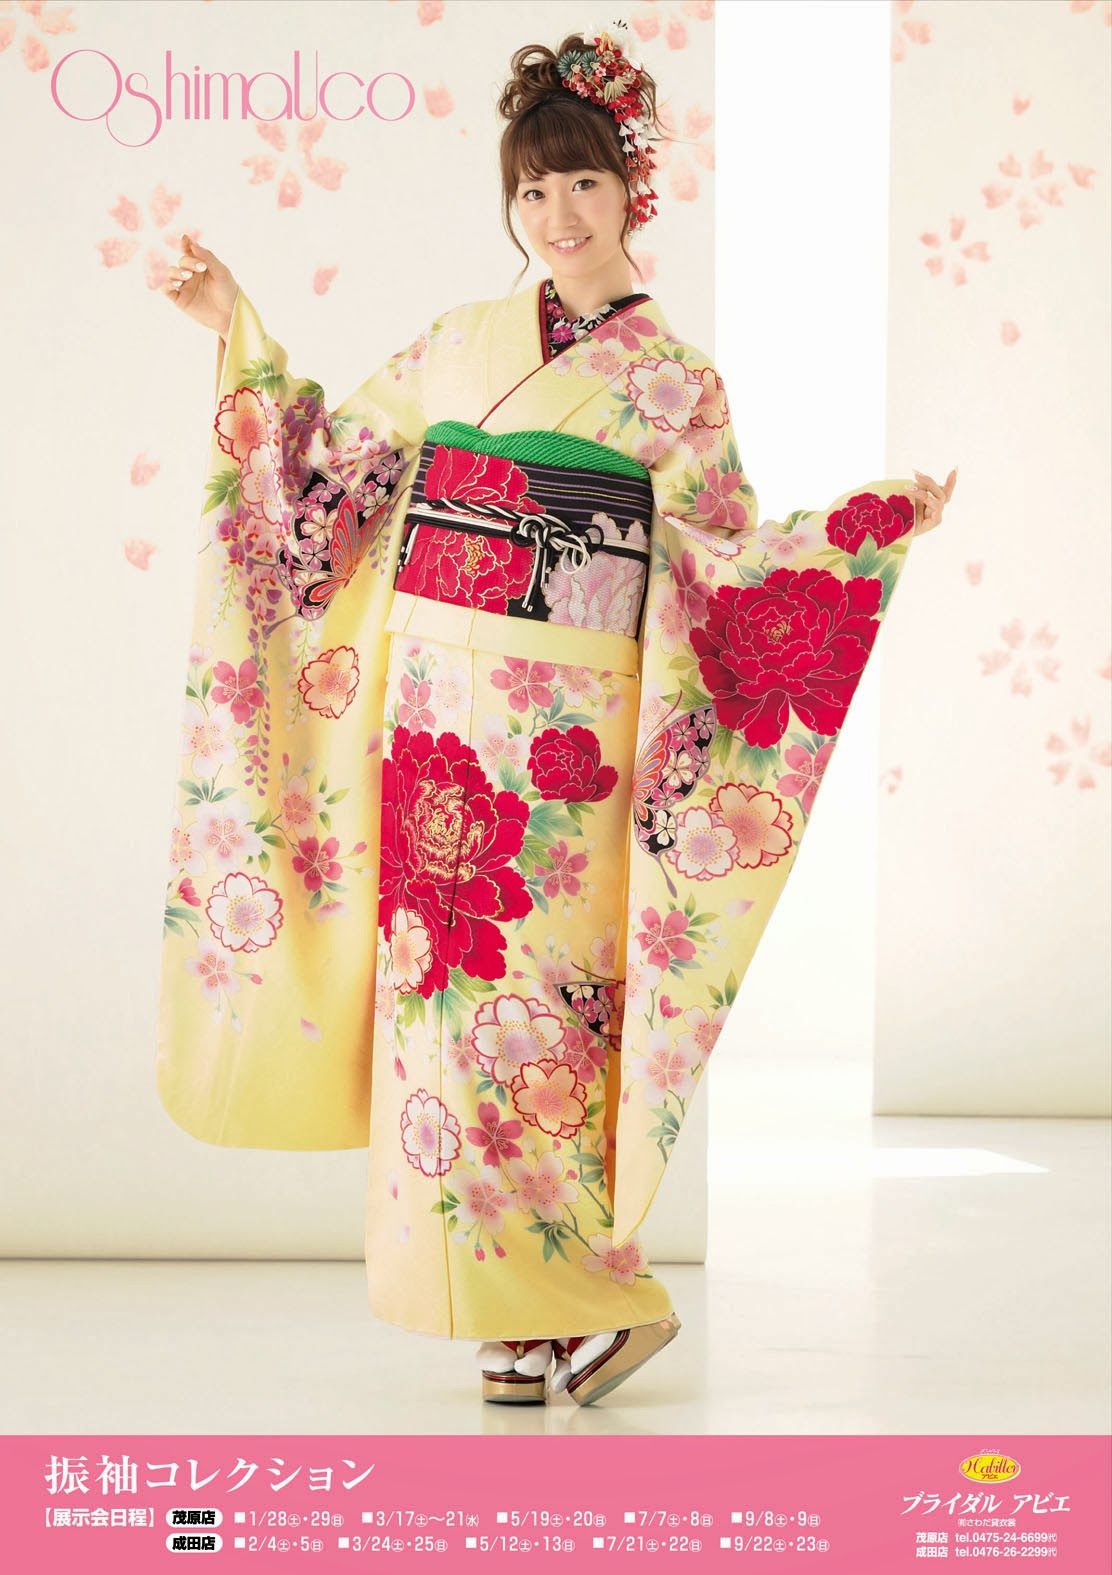 Japan Fashion 日本ファッション: OshimaUco Furisode (大島優子 振袖)